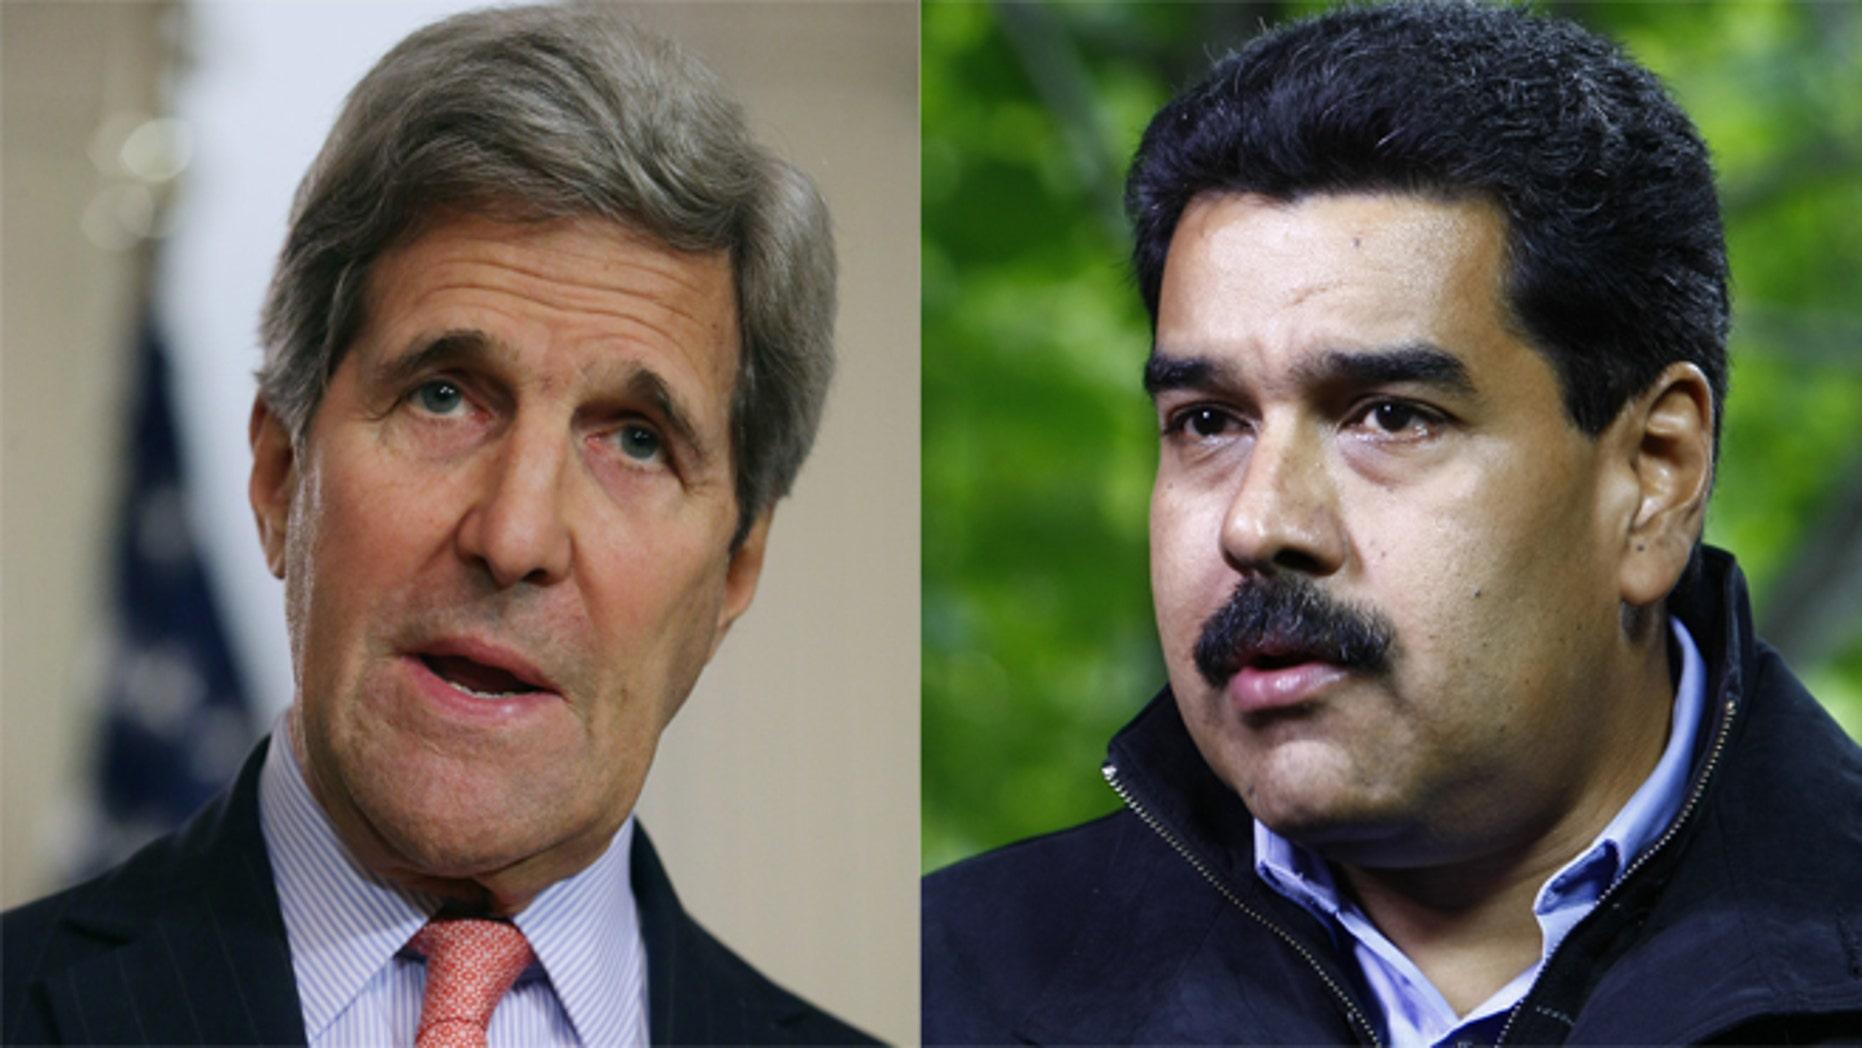 left: Secretary of State John Kerry; right: Venezuelan President Nicolas Maduro